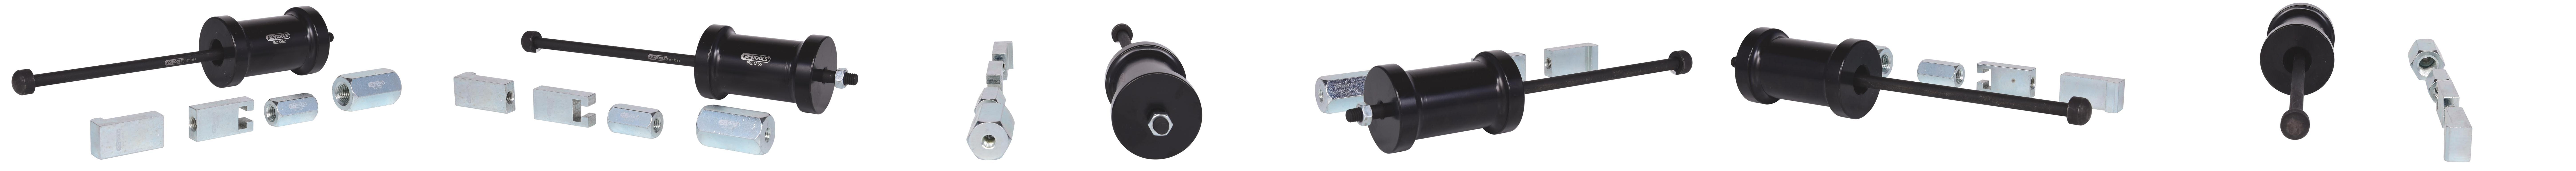 6-tlg 152.1405 KS TOOLS Pumpe//Düse und TDi-Düsen Auszieher-Satz